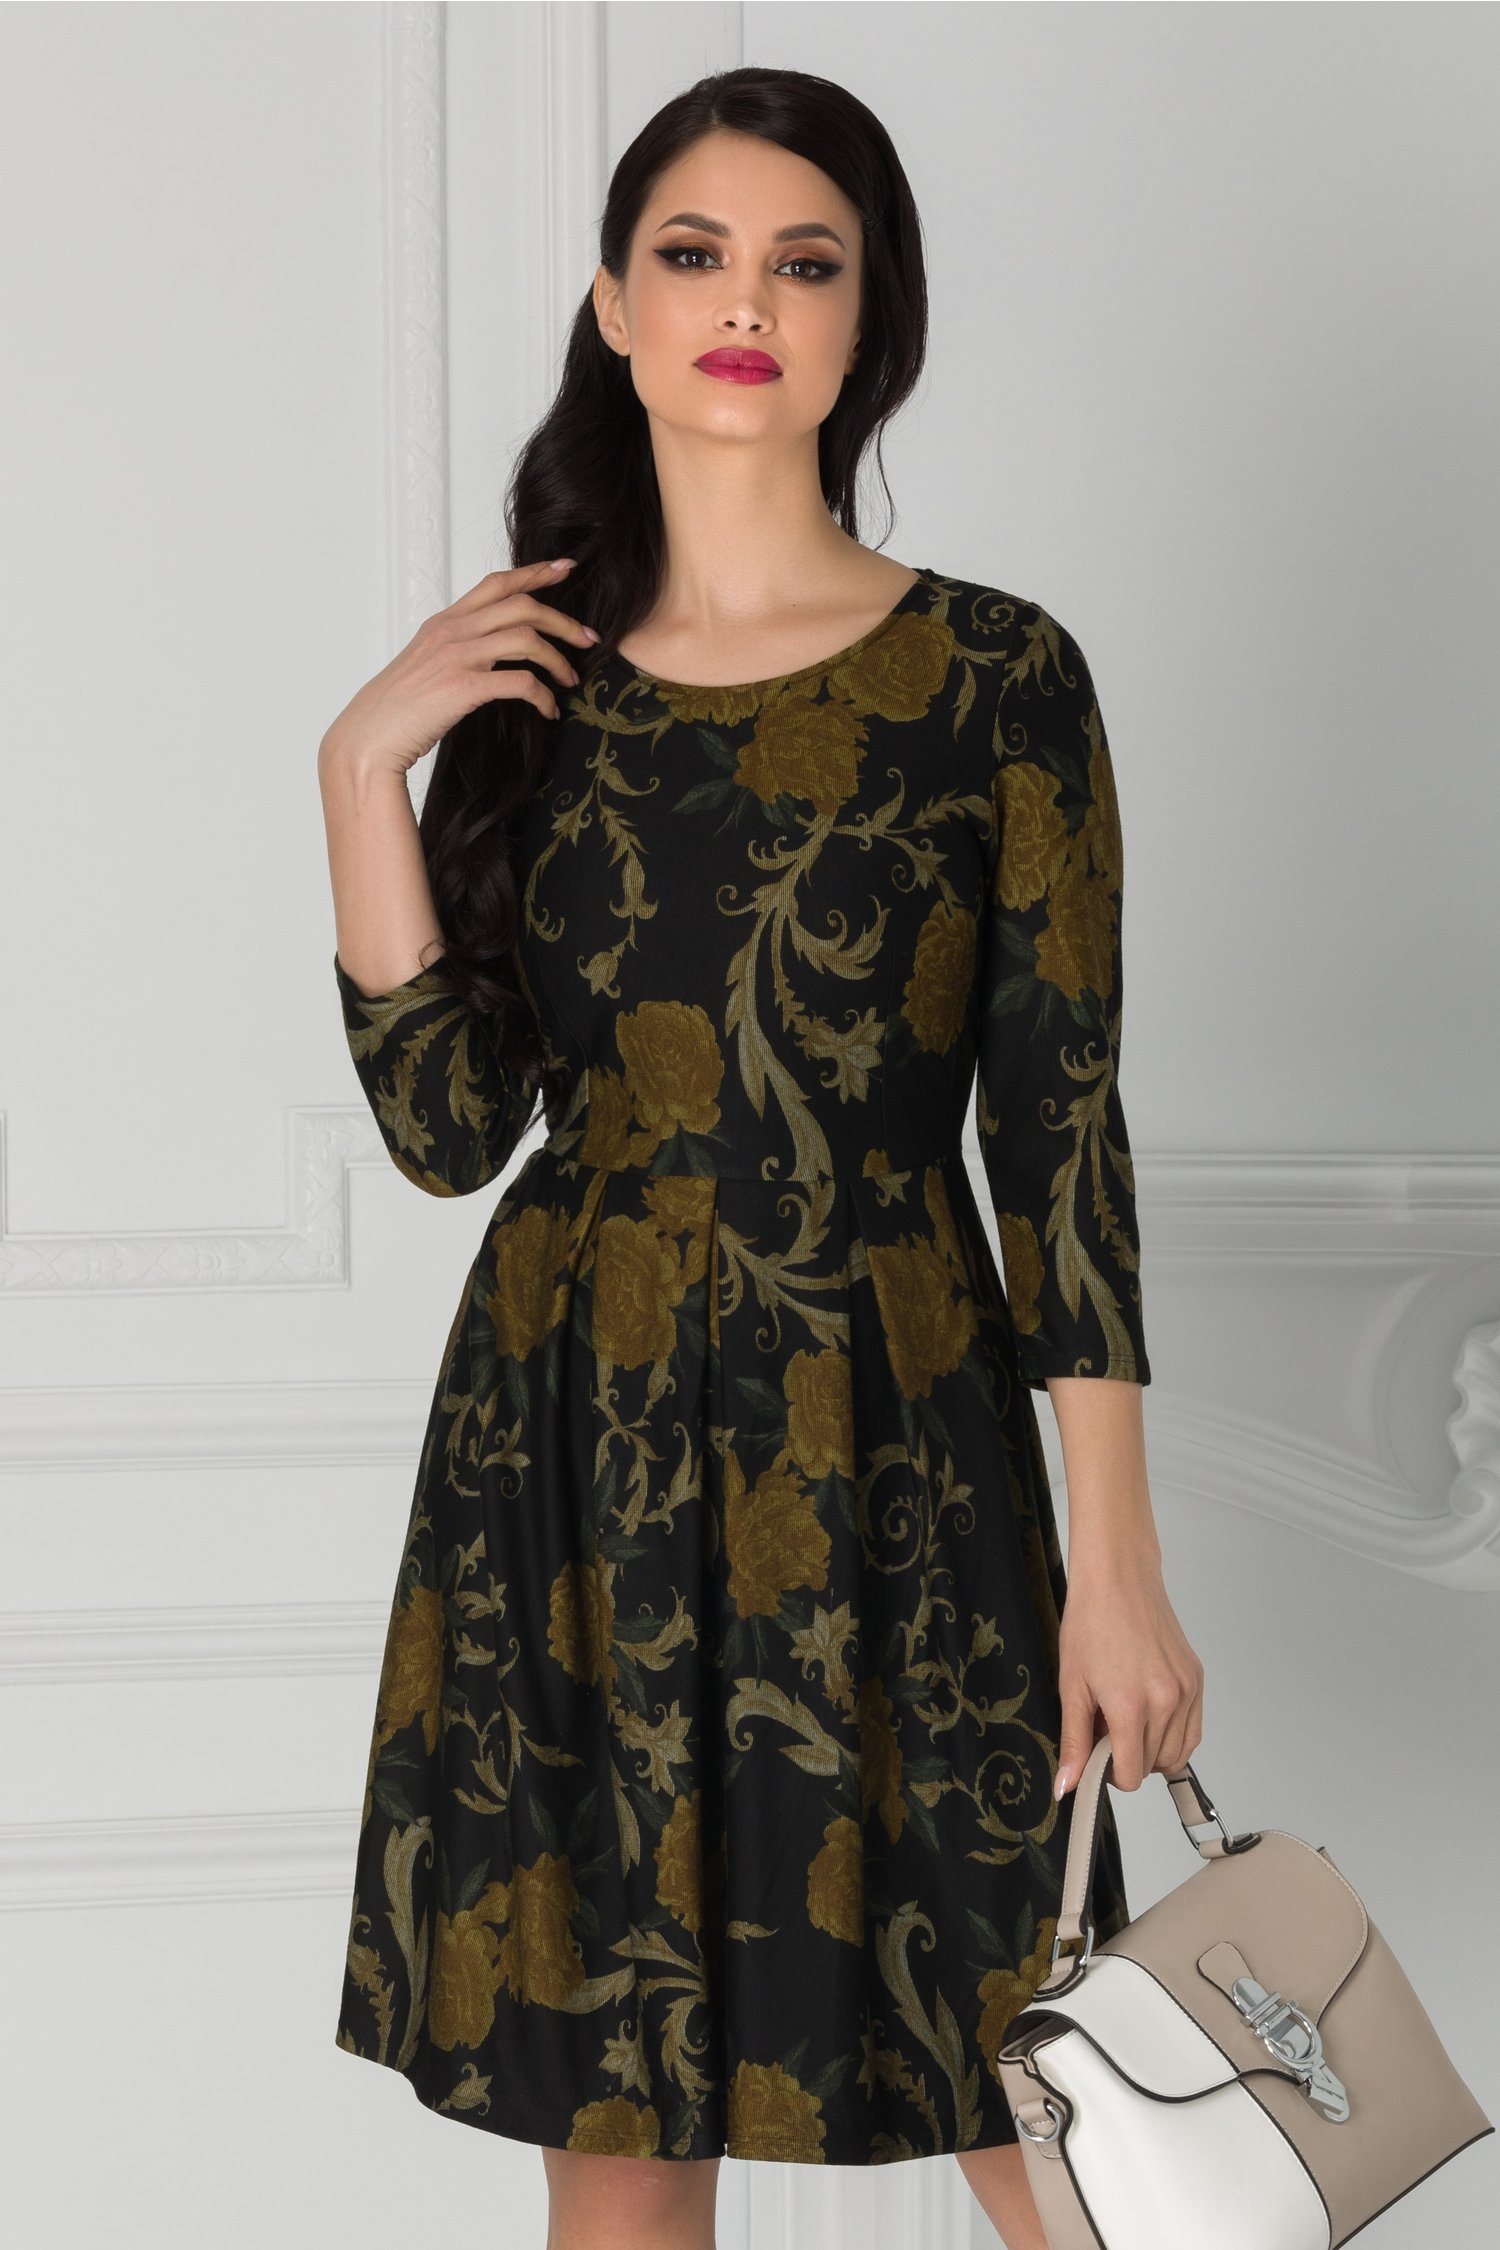 Rochie Nico neagra cu flori galben mustar